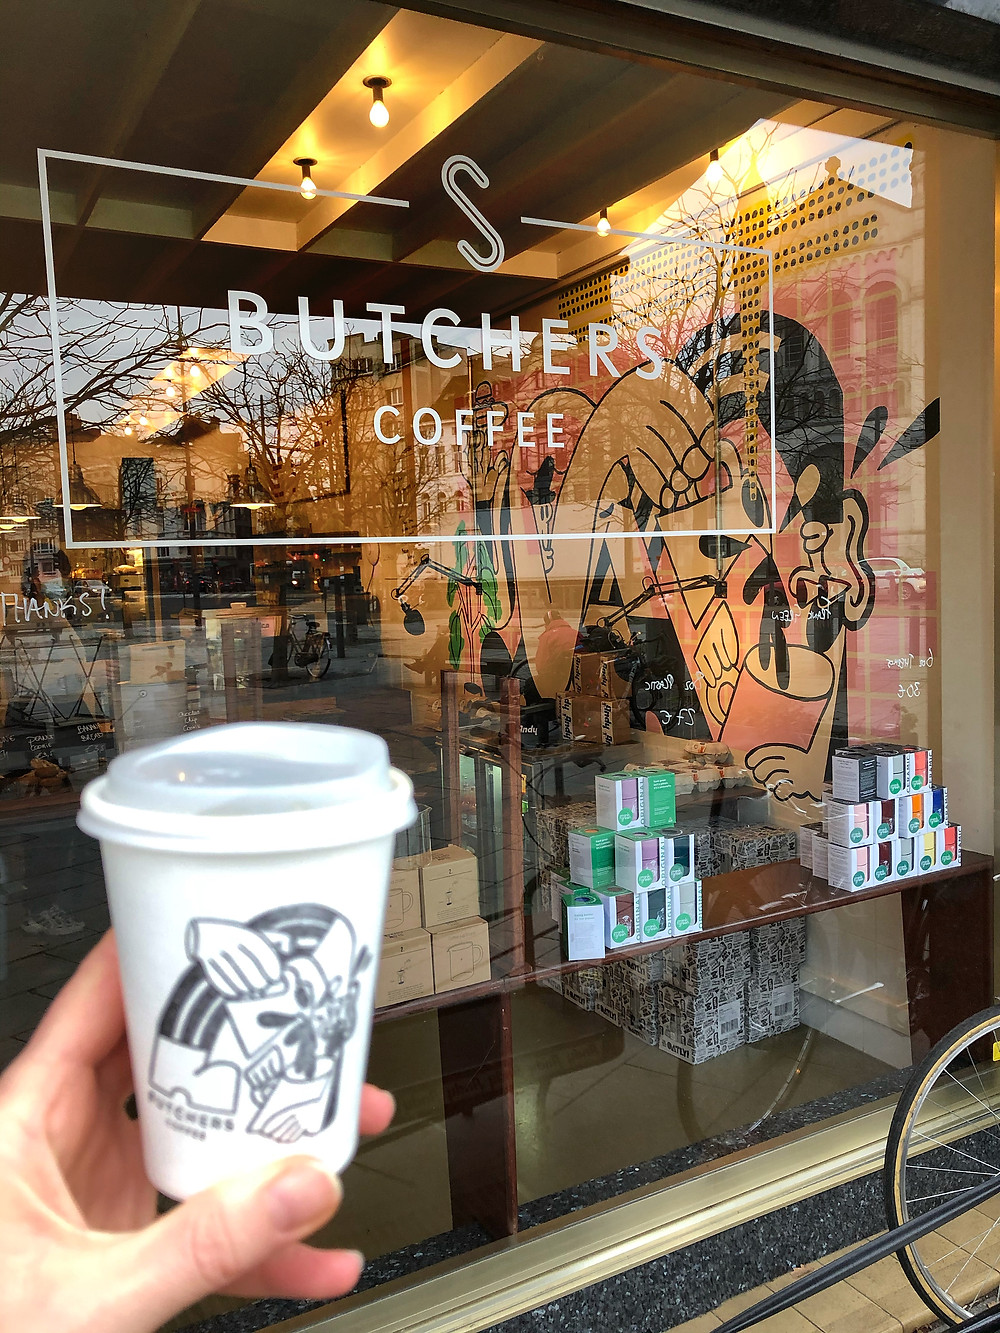 Butchers Coffee, take away coffee, Antwerp